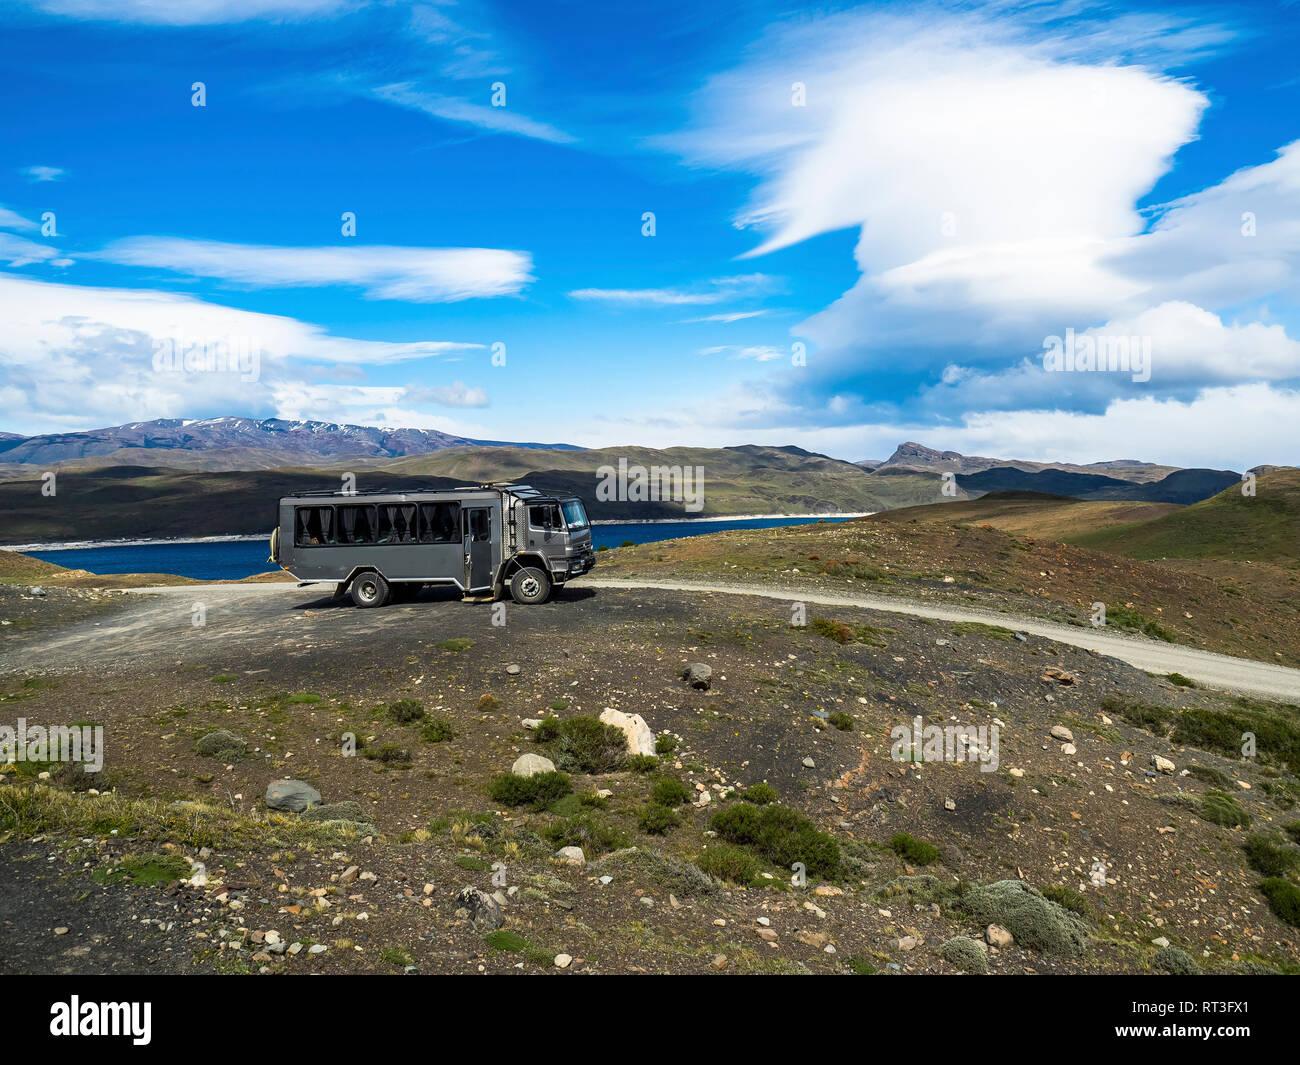 Chile, Patagonia, Torres del Paine National Park, Cerro Paine Grande and  Torres del Paine, Lago Nordenskjold, bus - Stock Image